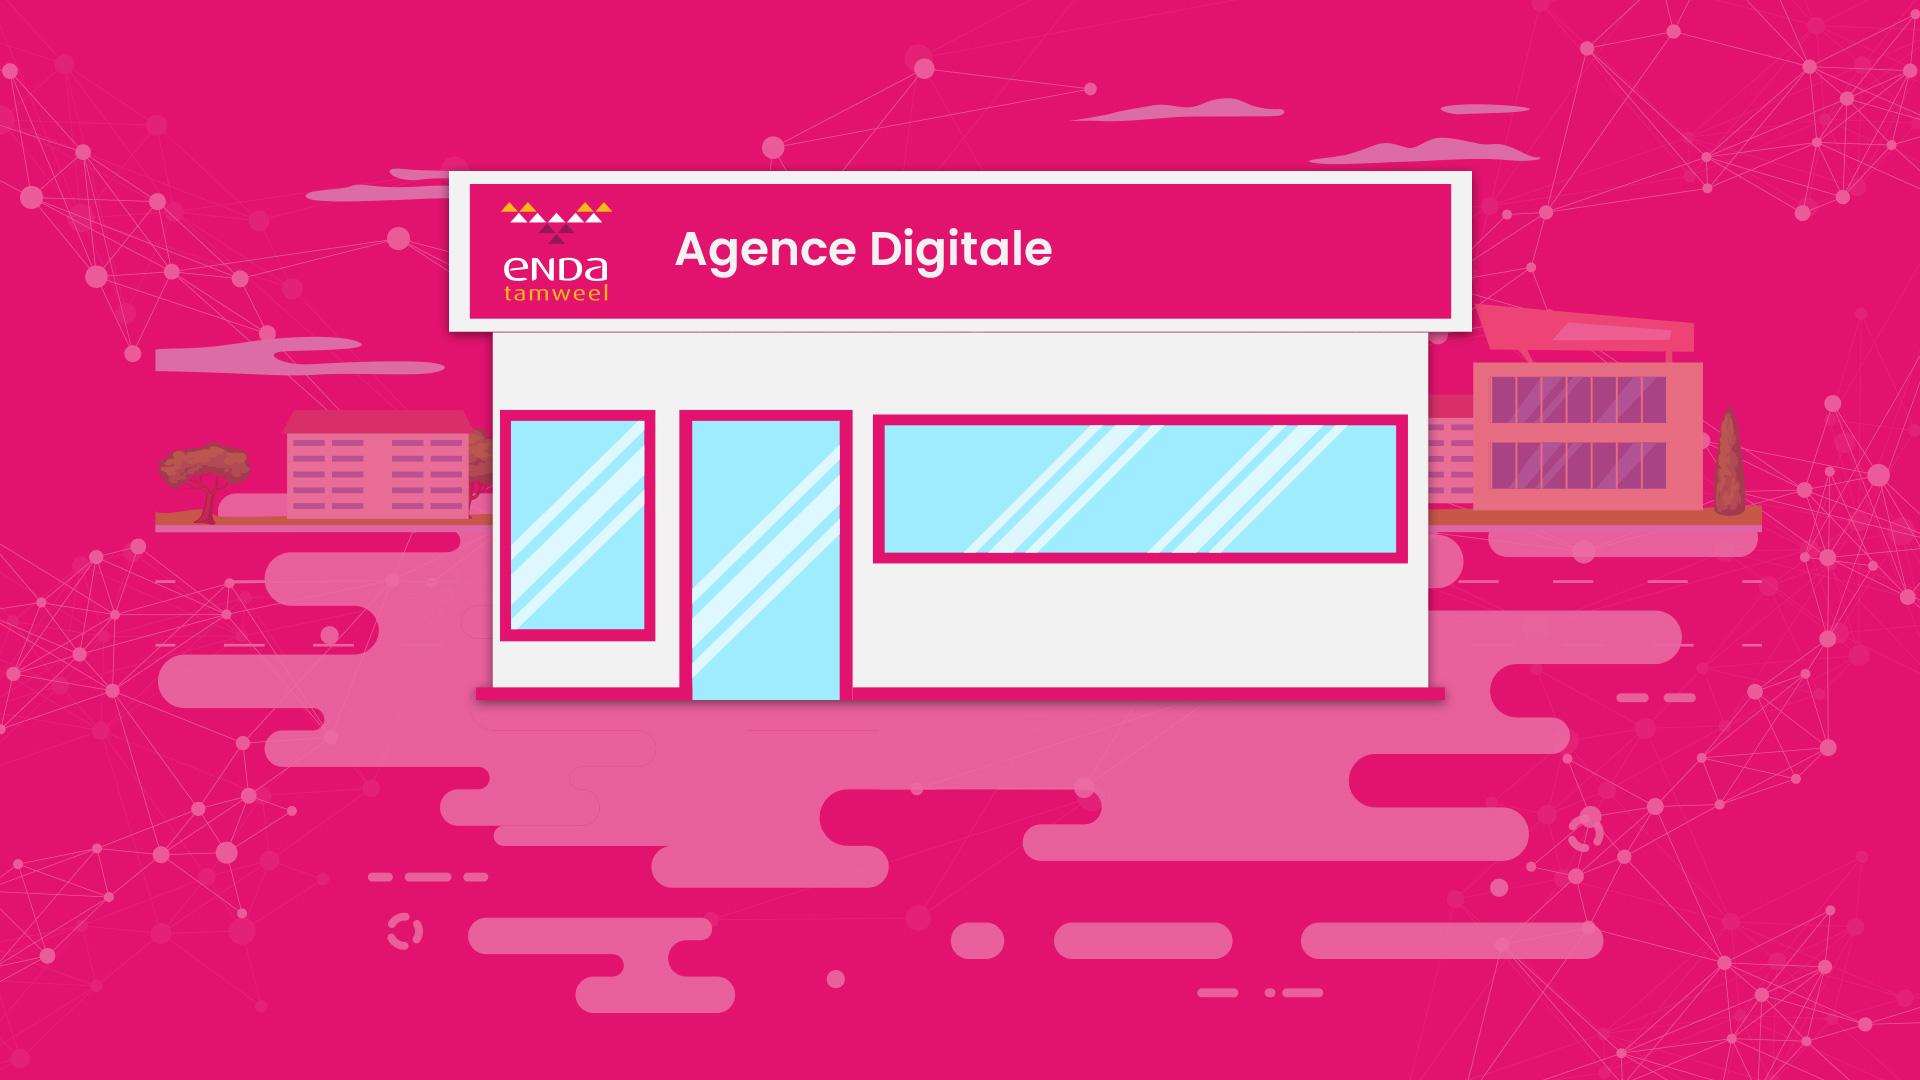 Agence-Digitale-Enda-tamweel